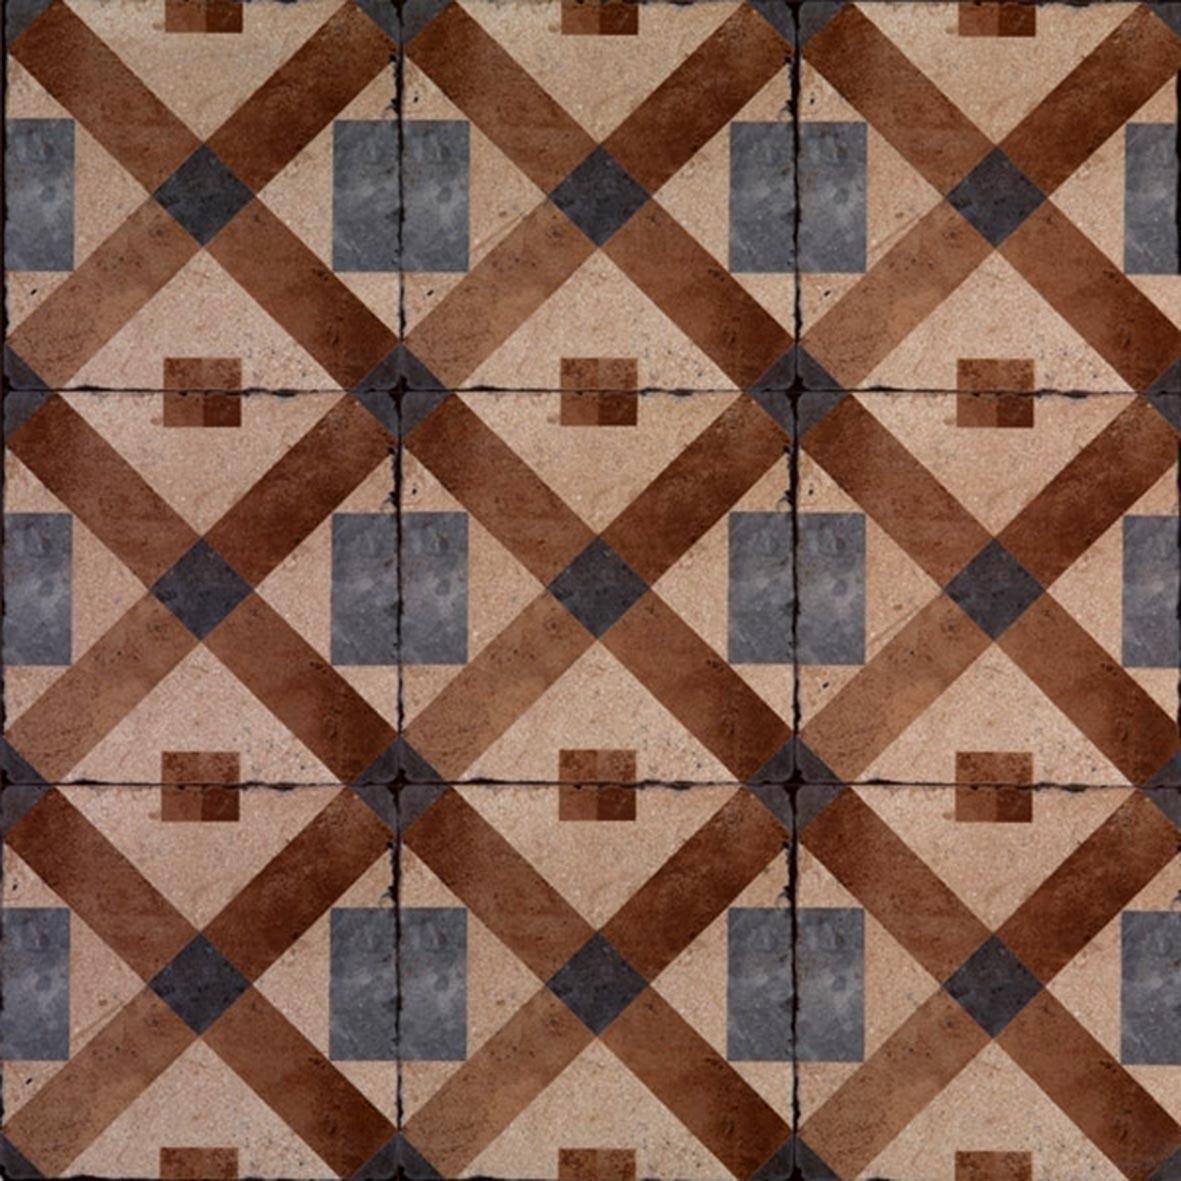 Adesivo para Azulejo Ladrilho Hidráulico Córdoba Vinil 15x15cm 16 peças Cosi Dimora